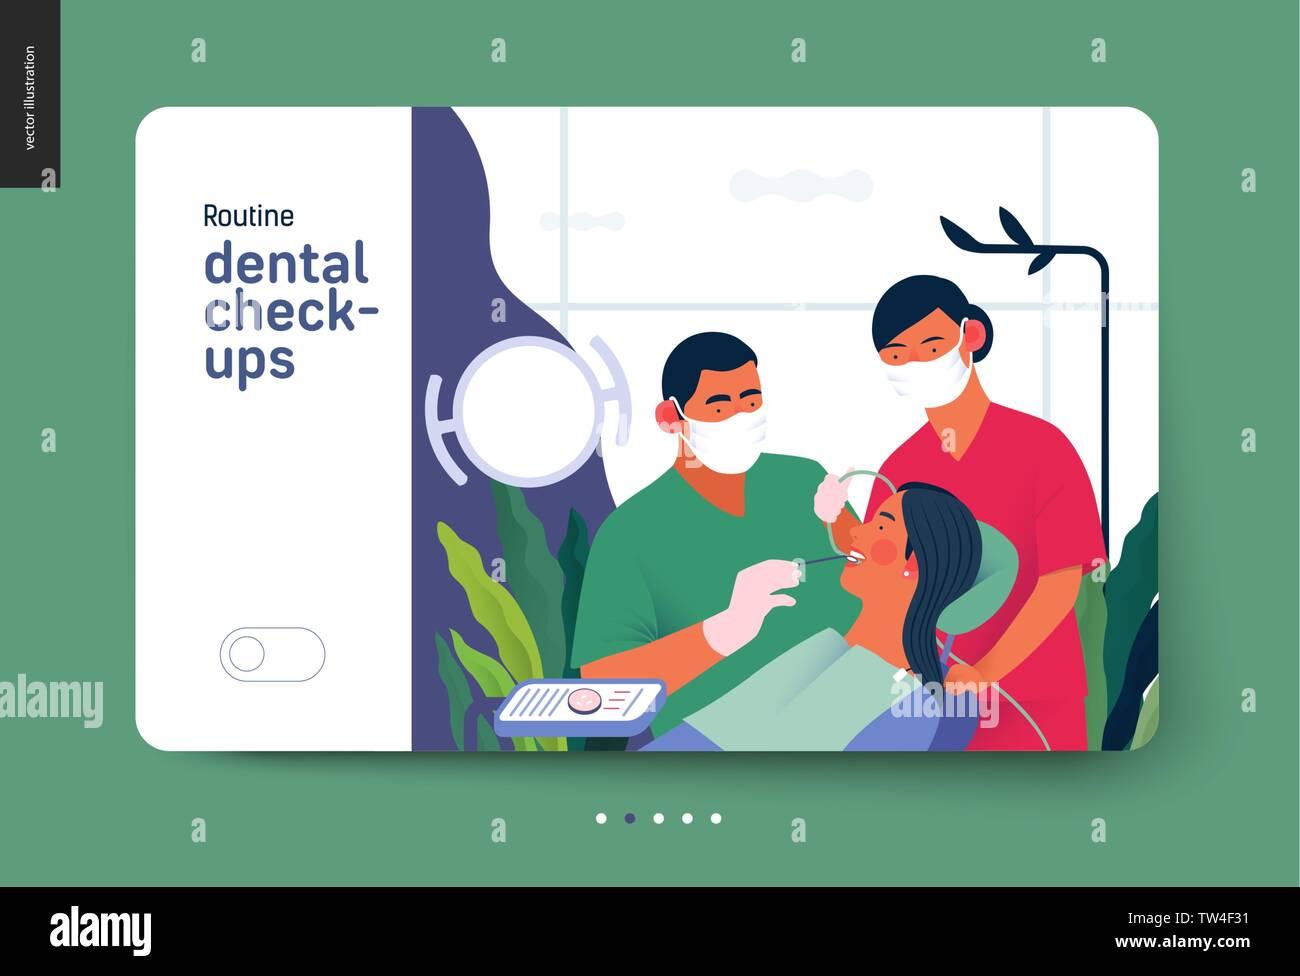 Medical insurance template - routine dental checkups - modern flat vector concept digital illustration of a dental procedure - patient, dentist checki - Stock Image